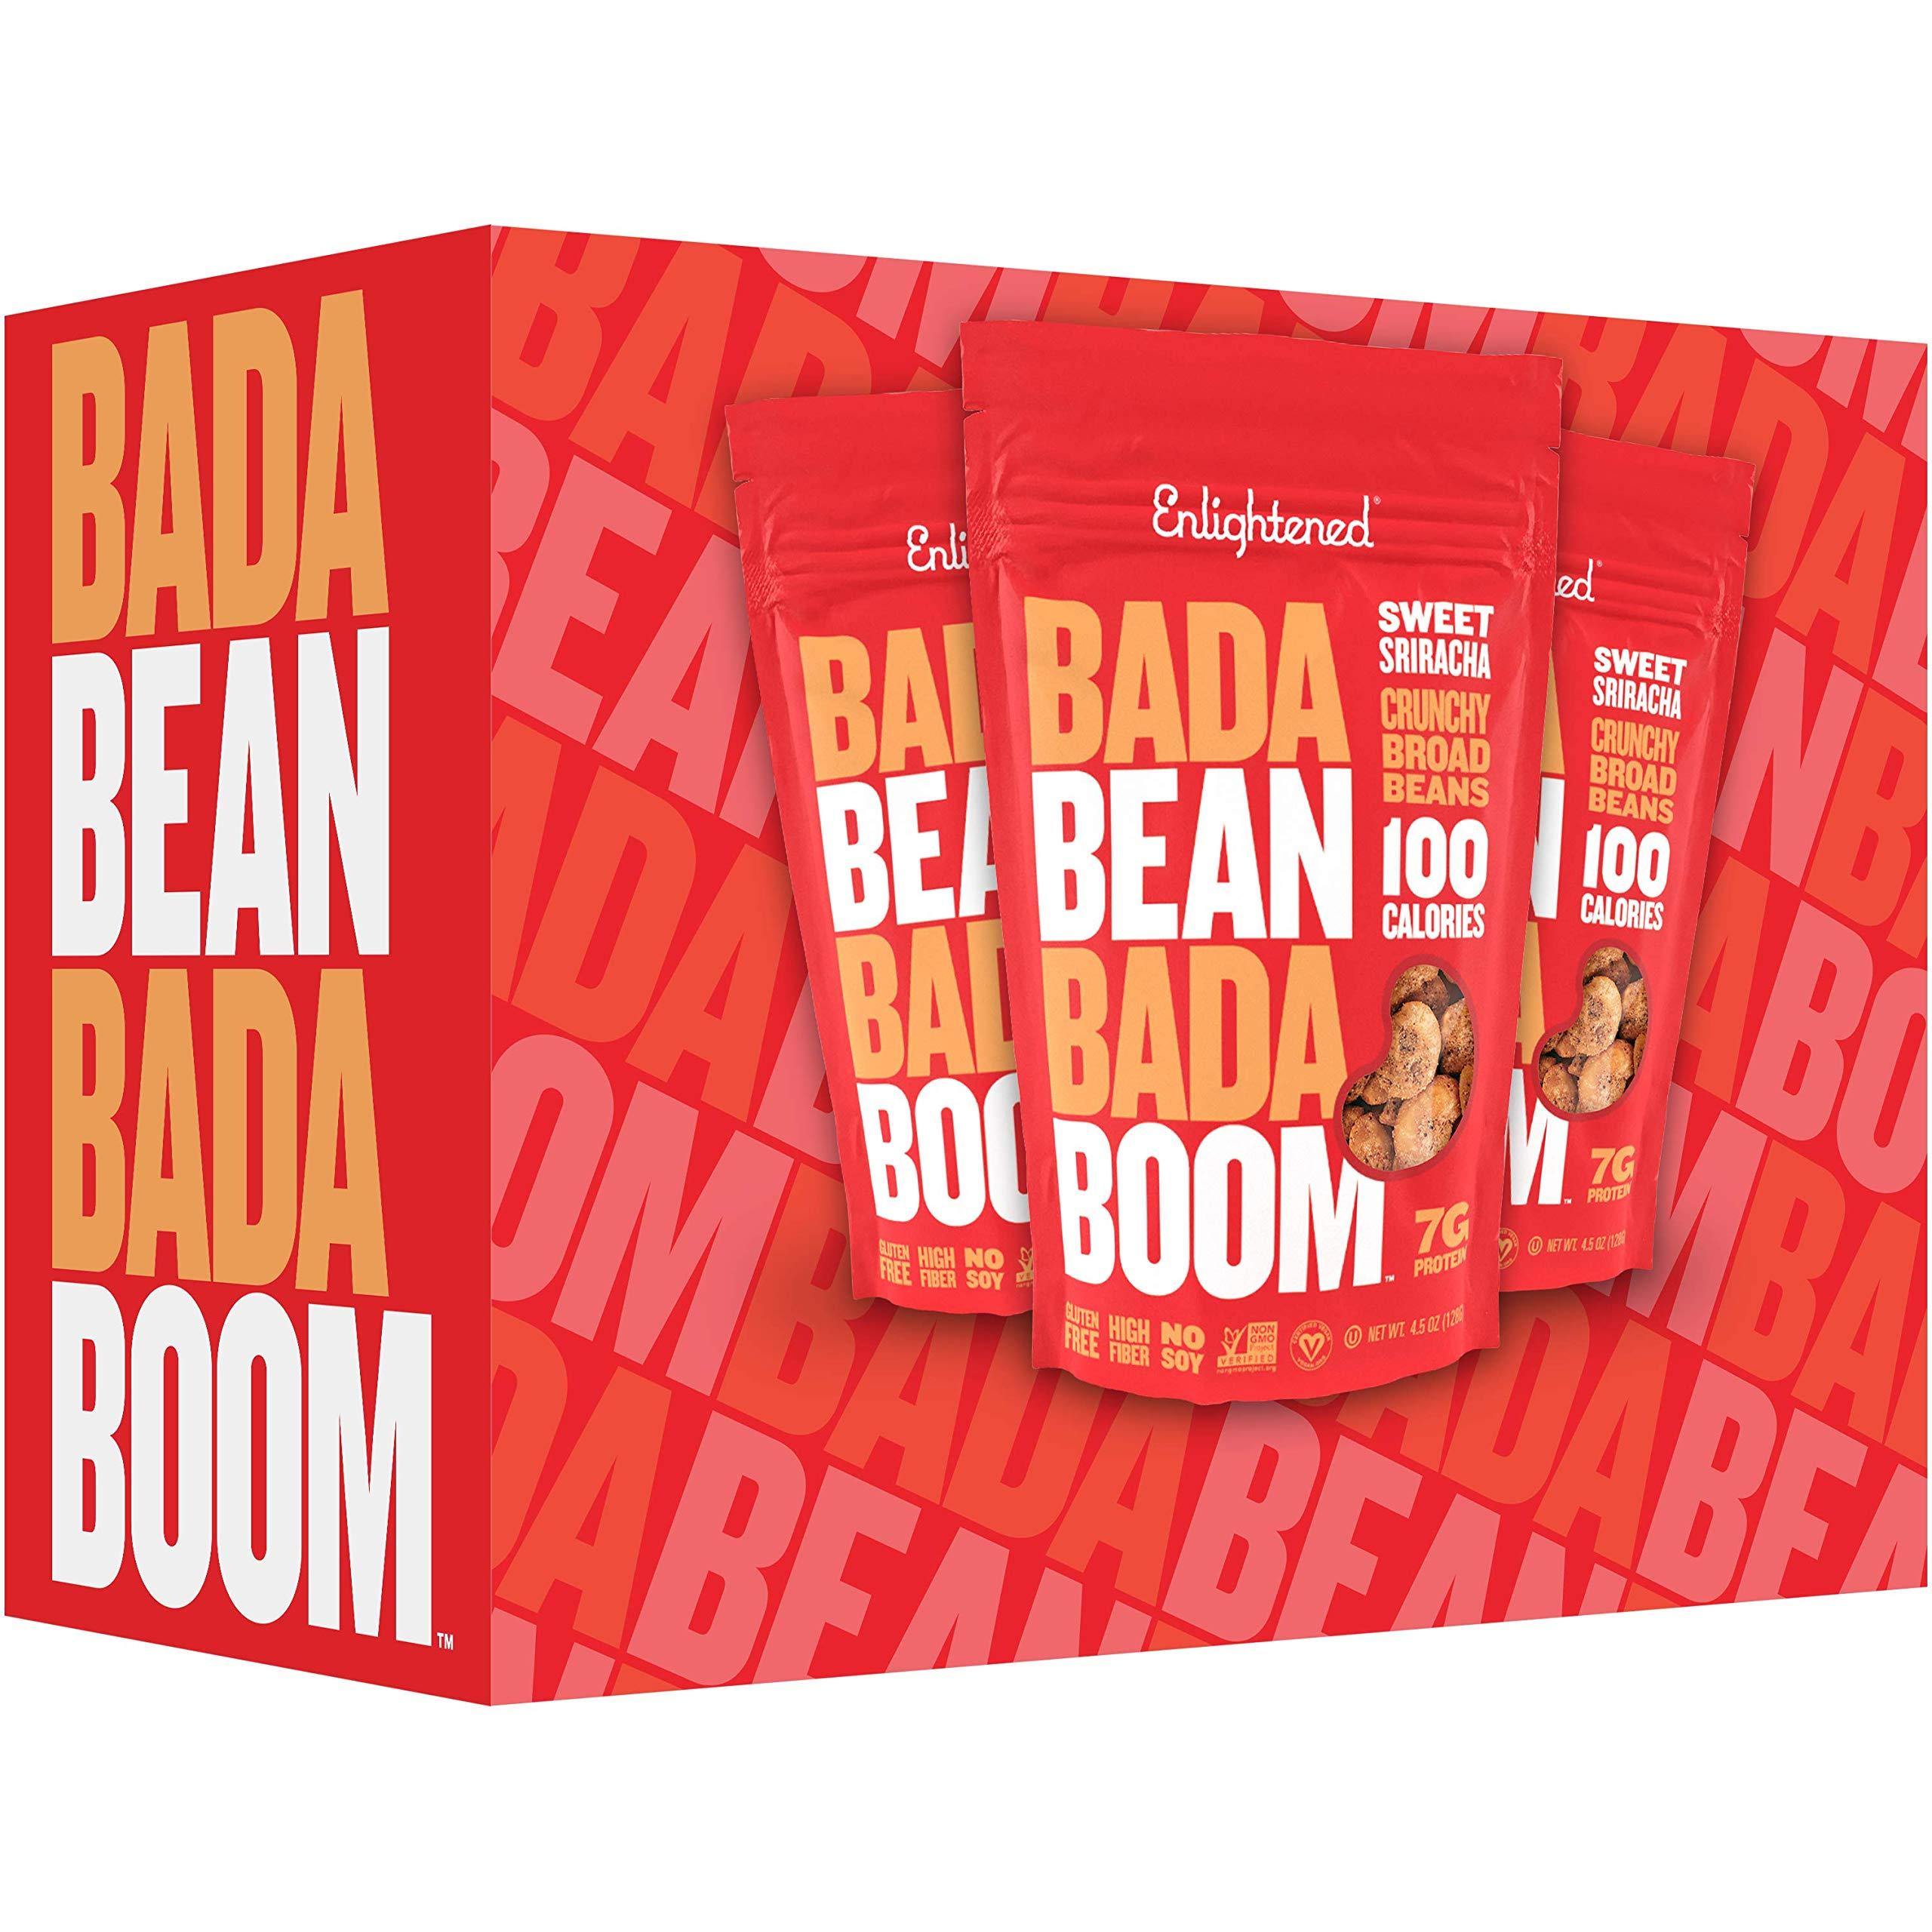 Enlightened Bada Bean Bada Boom Plant Protein Gluten Free Roasted Broad (Fava) Bean Snack, Sriracha, 4.5 Ounce (12 Count) by Enlightened